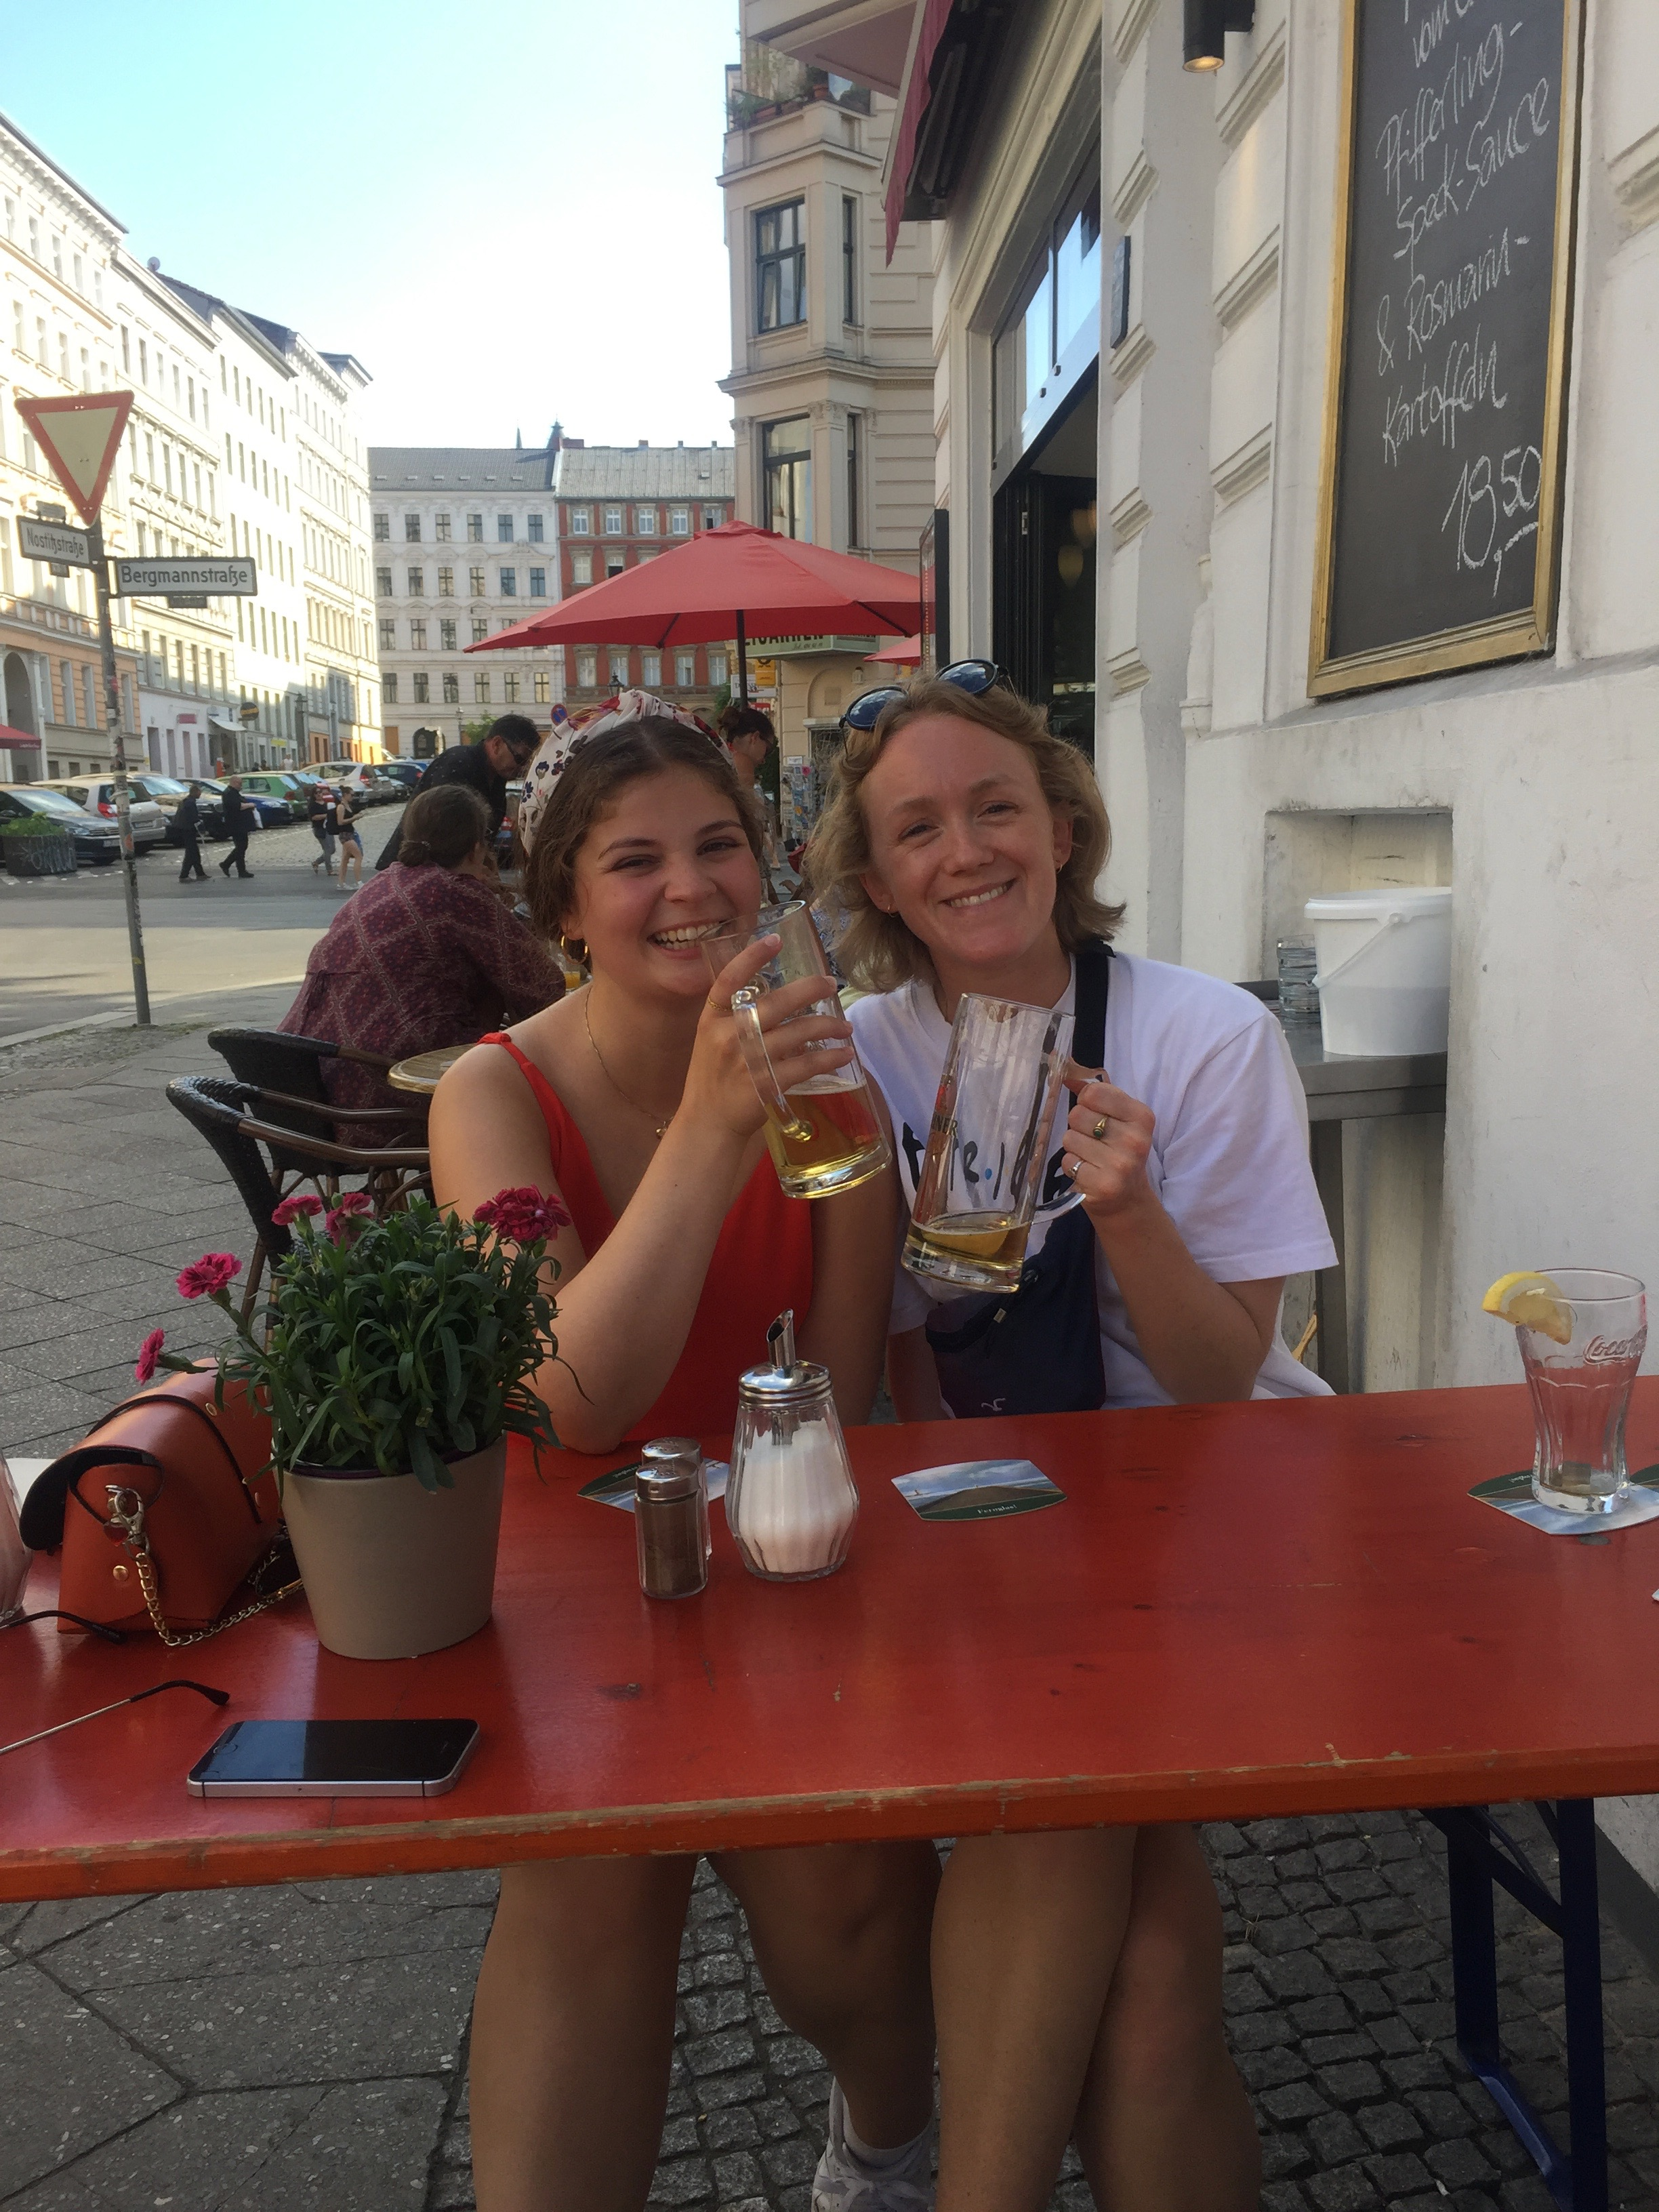 Met my lovely friend Cassandra, from the Bårdar academy in Norway, randomly in Berlin. Hadn't seen each other in ages!